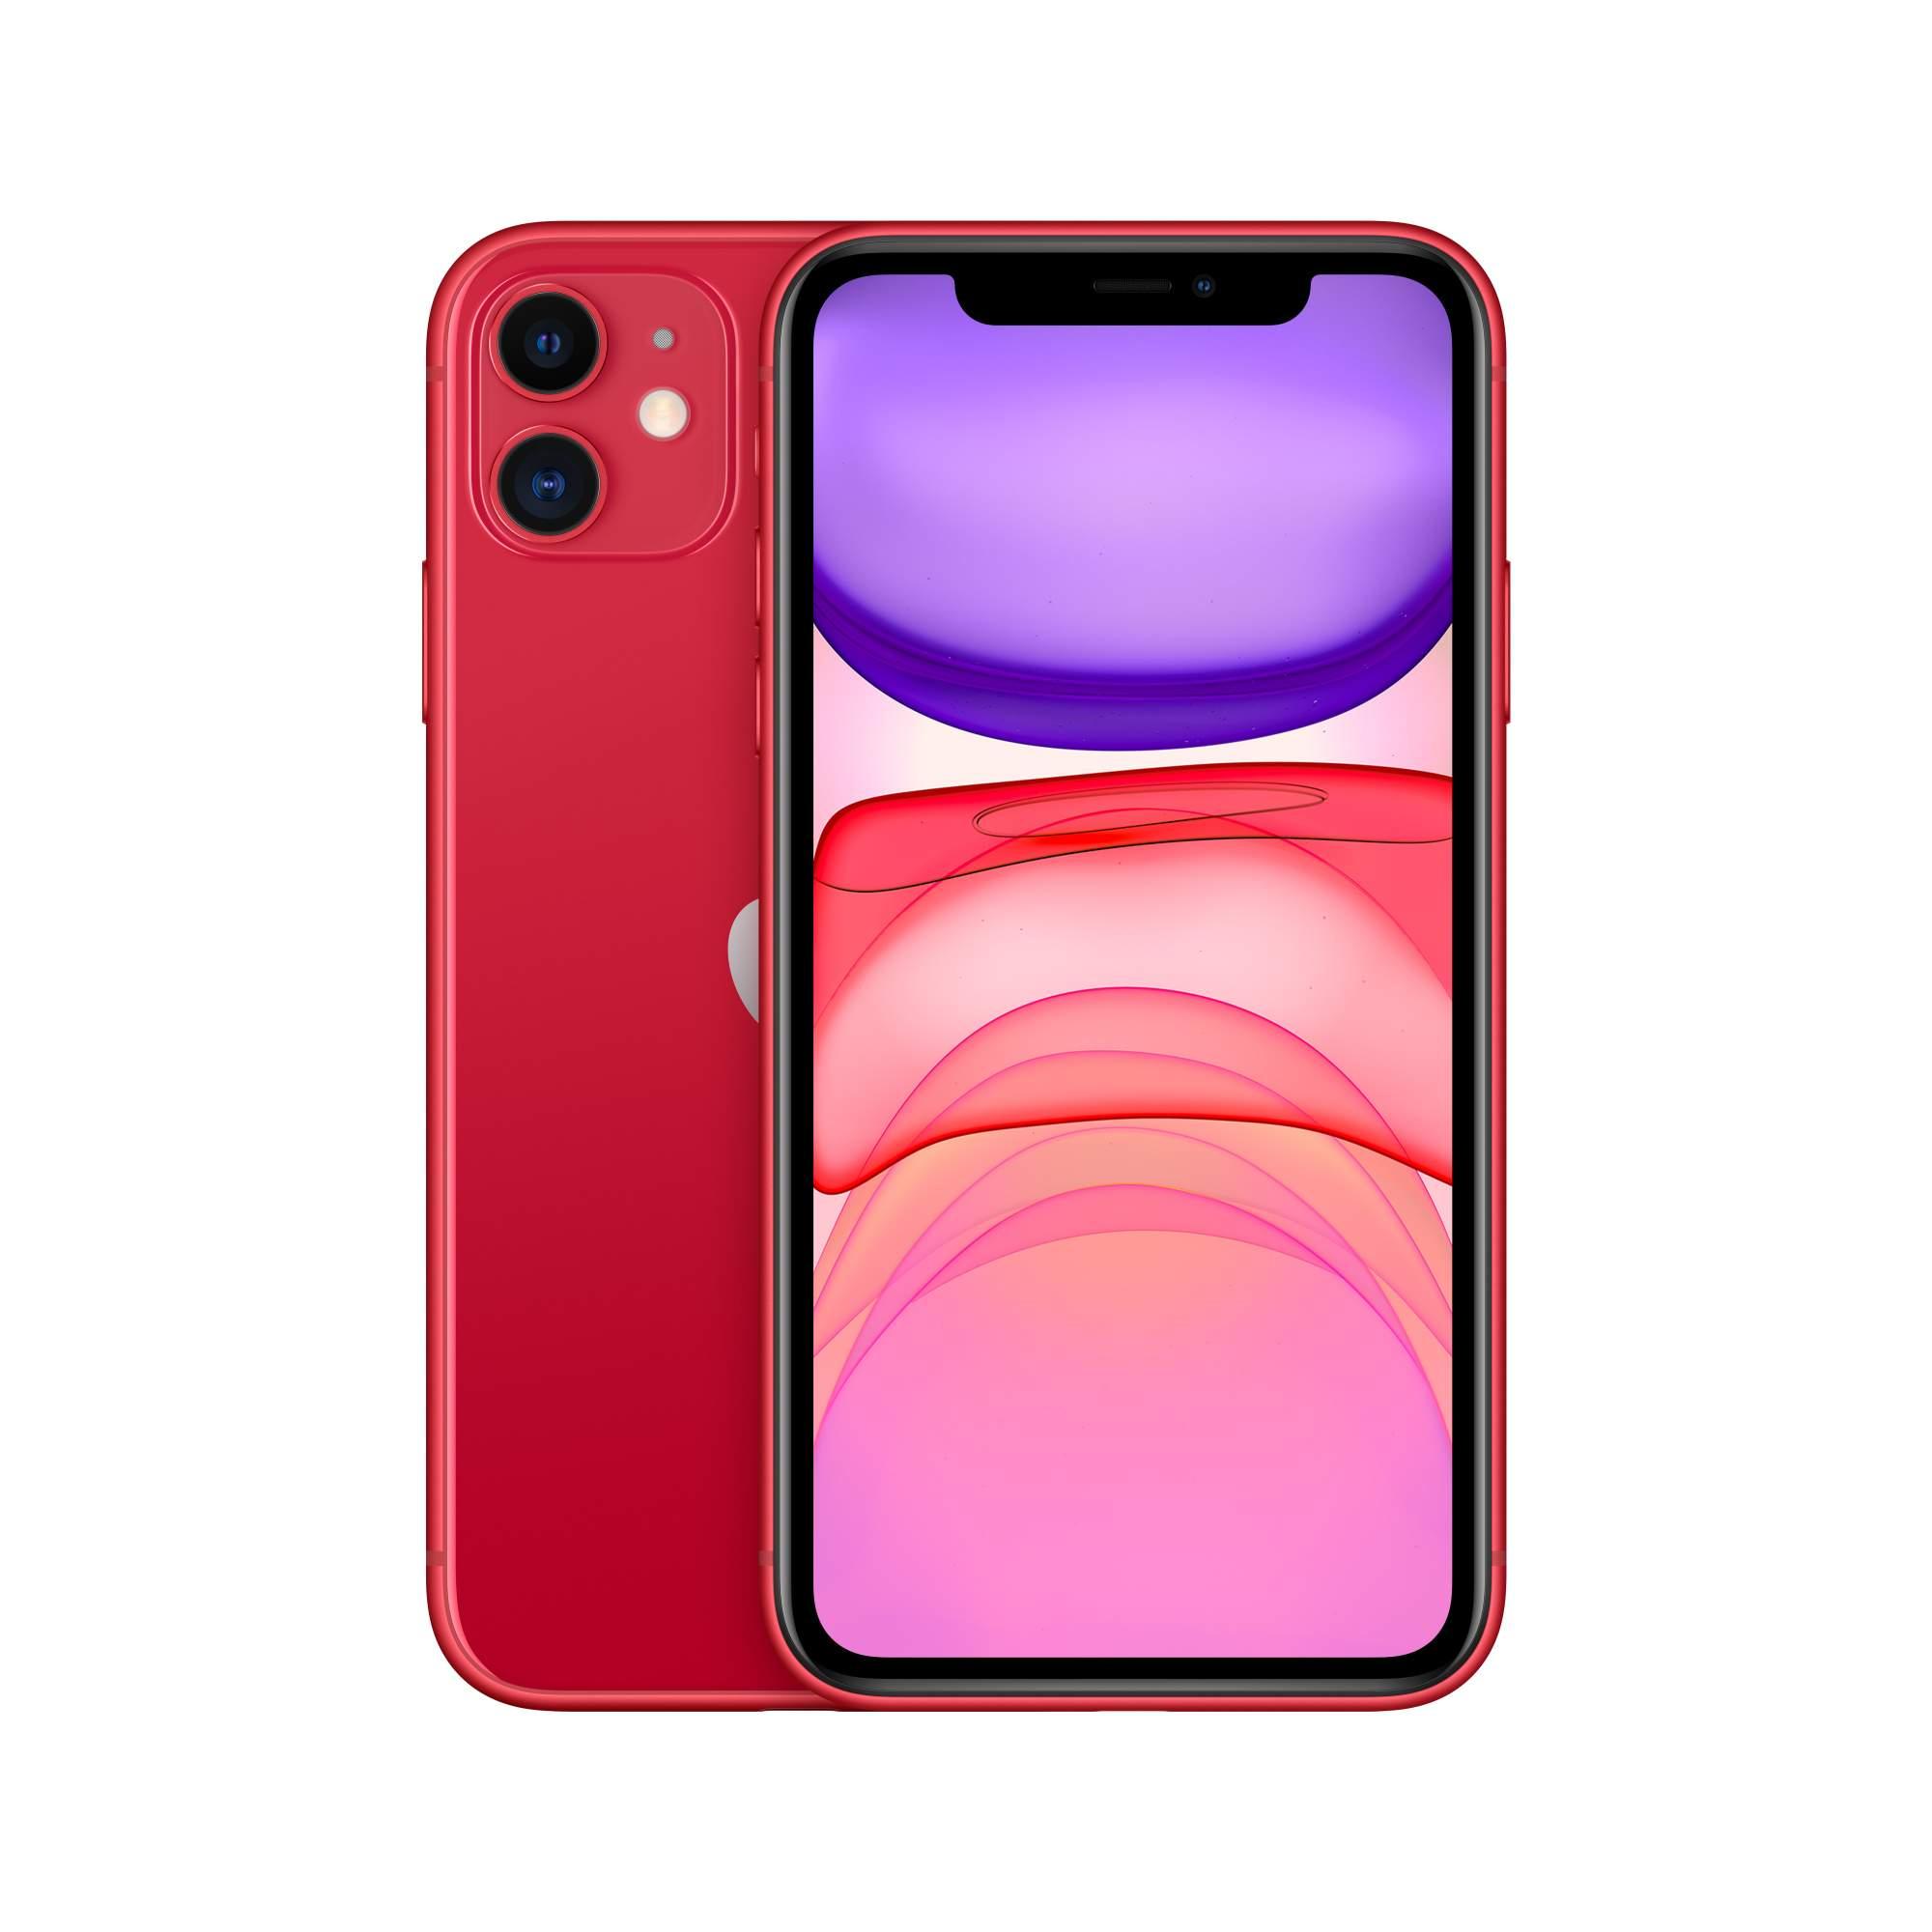 Смартфон Apple iPhone 11 64GB (PRODUCT)RED (MWLV2RU/A)